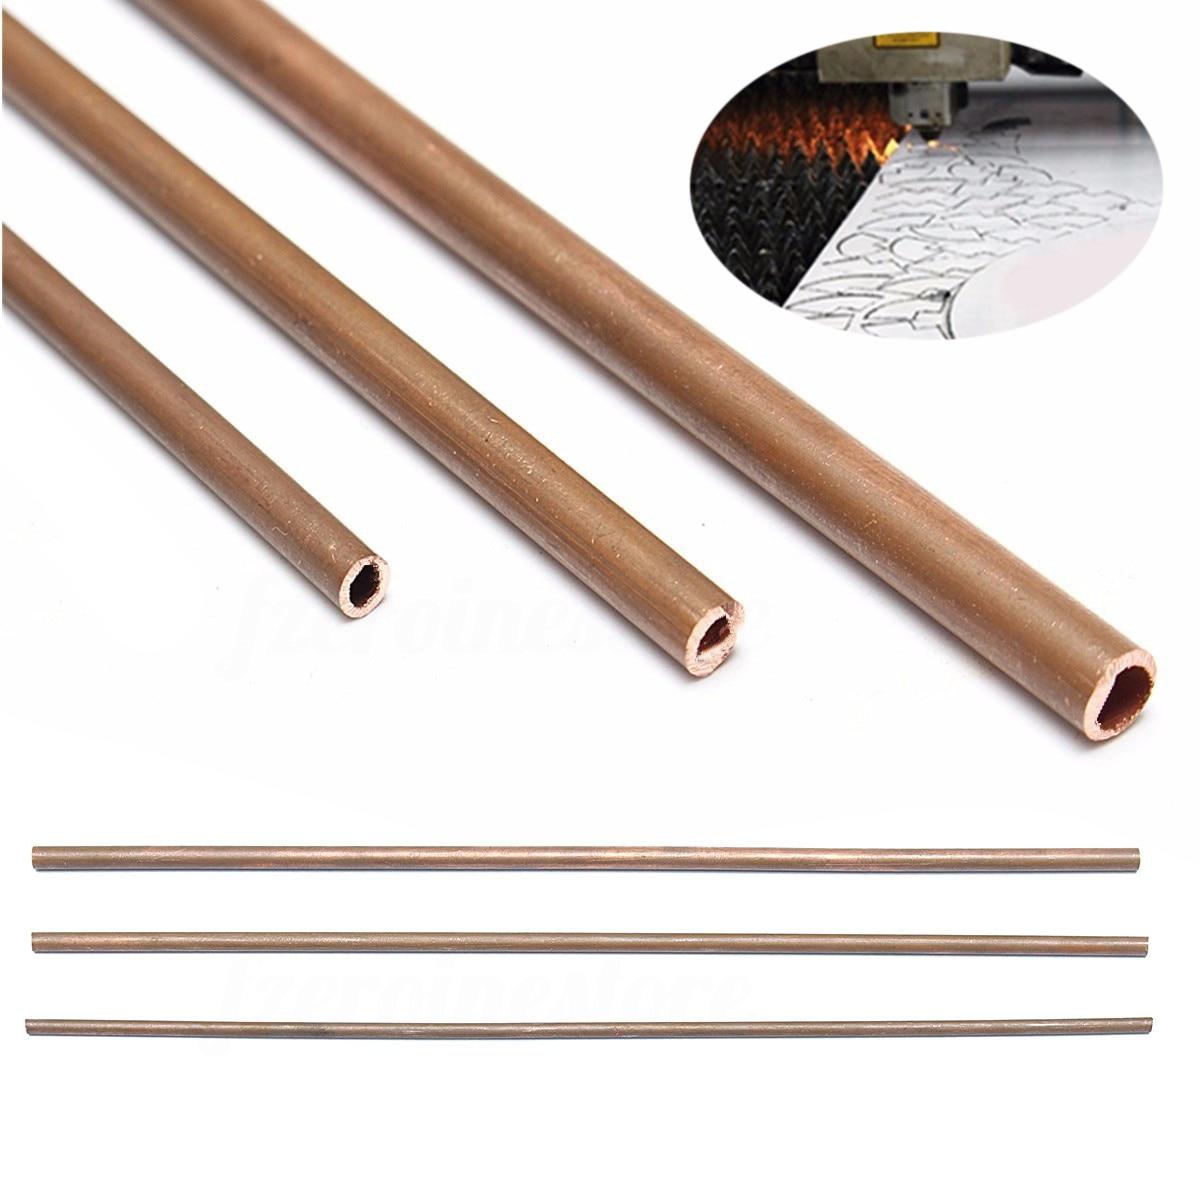 1pc New Copper Tube Plumbing Pipe DIY Rod 3mm/4mm/5mm Inner Diameter 300mm Length 5 10 355 mm flat head carbon rod copper coated for arc air gouging 50pcs